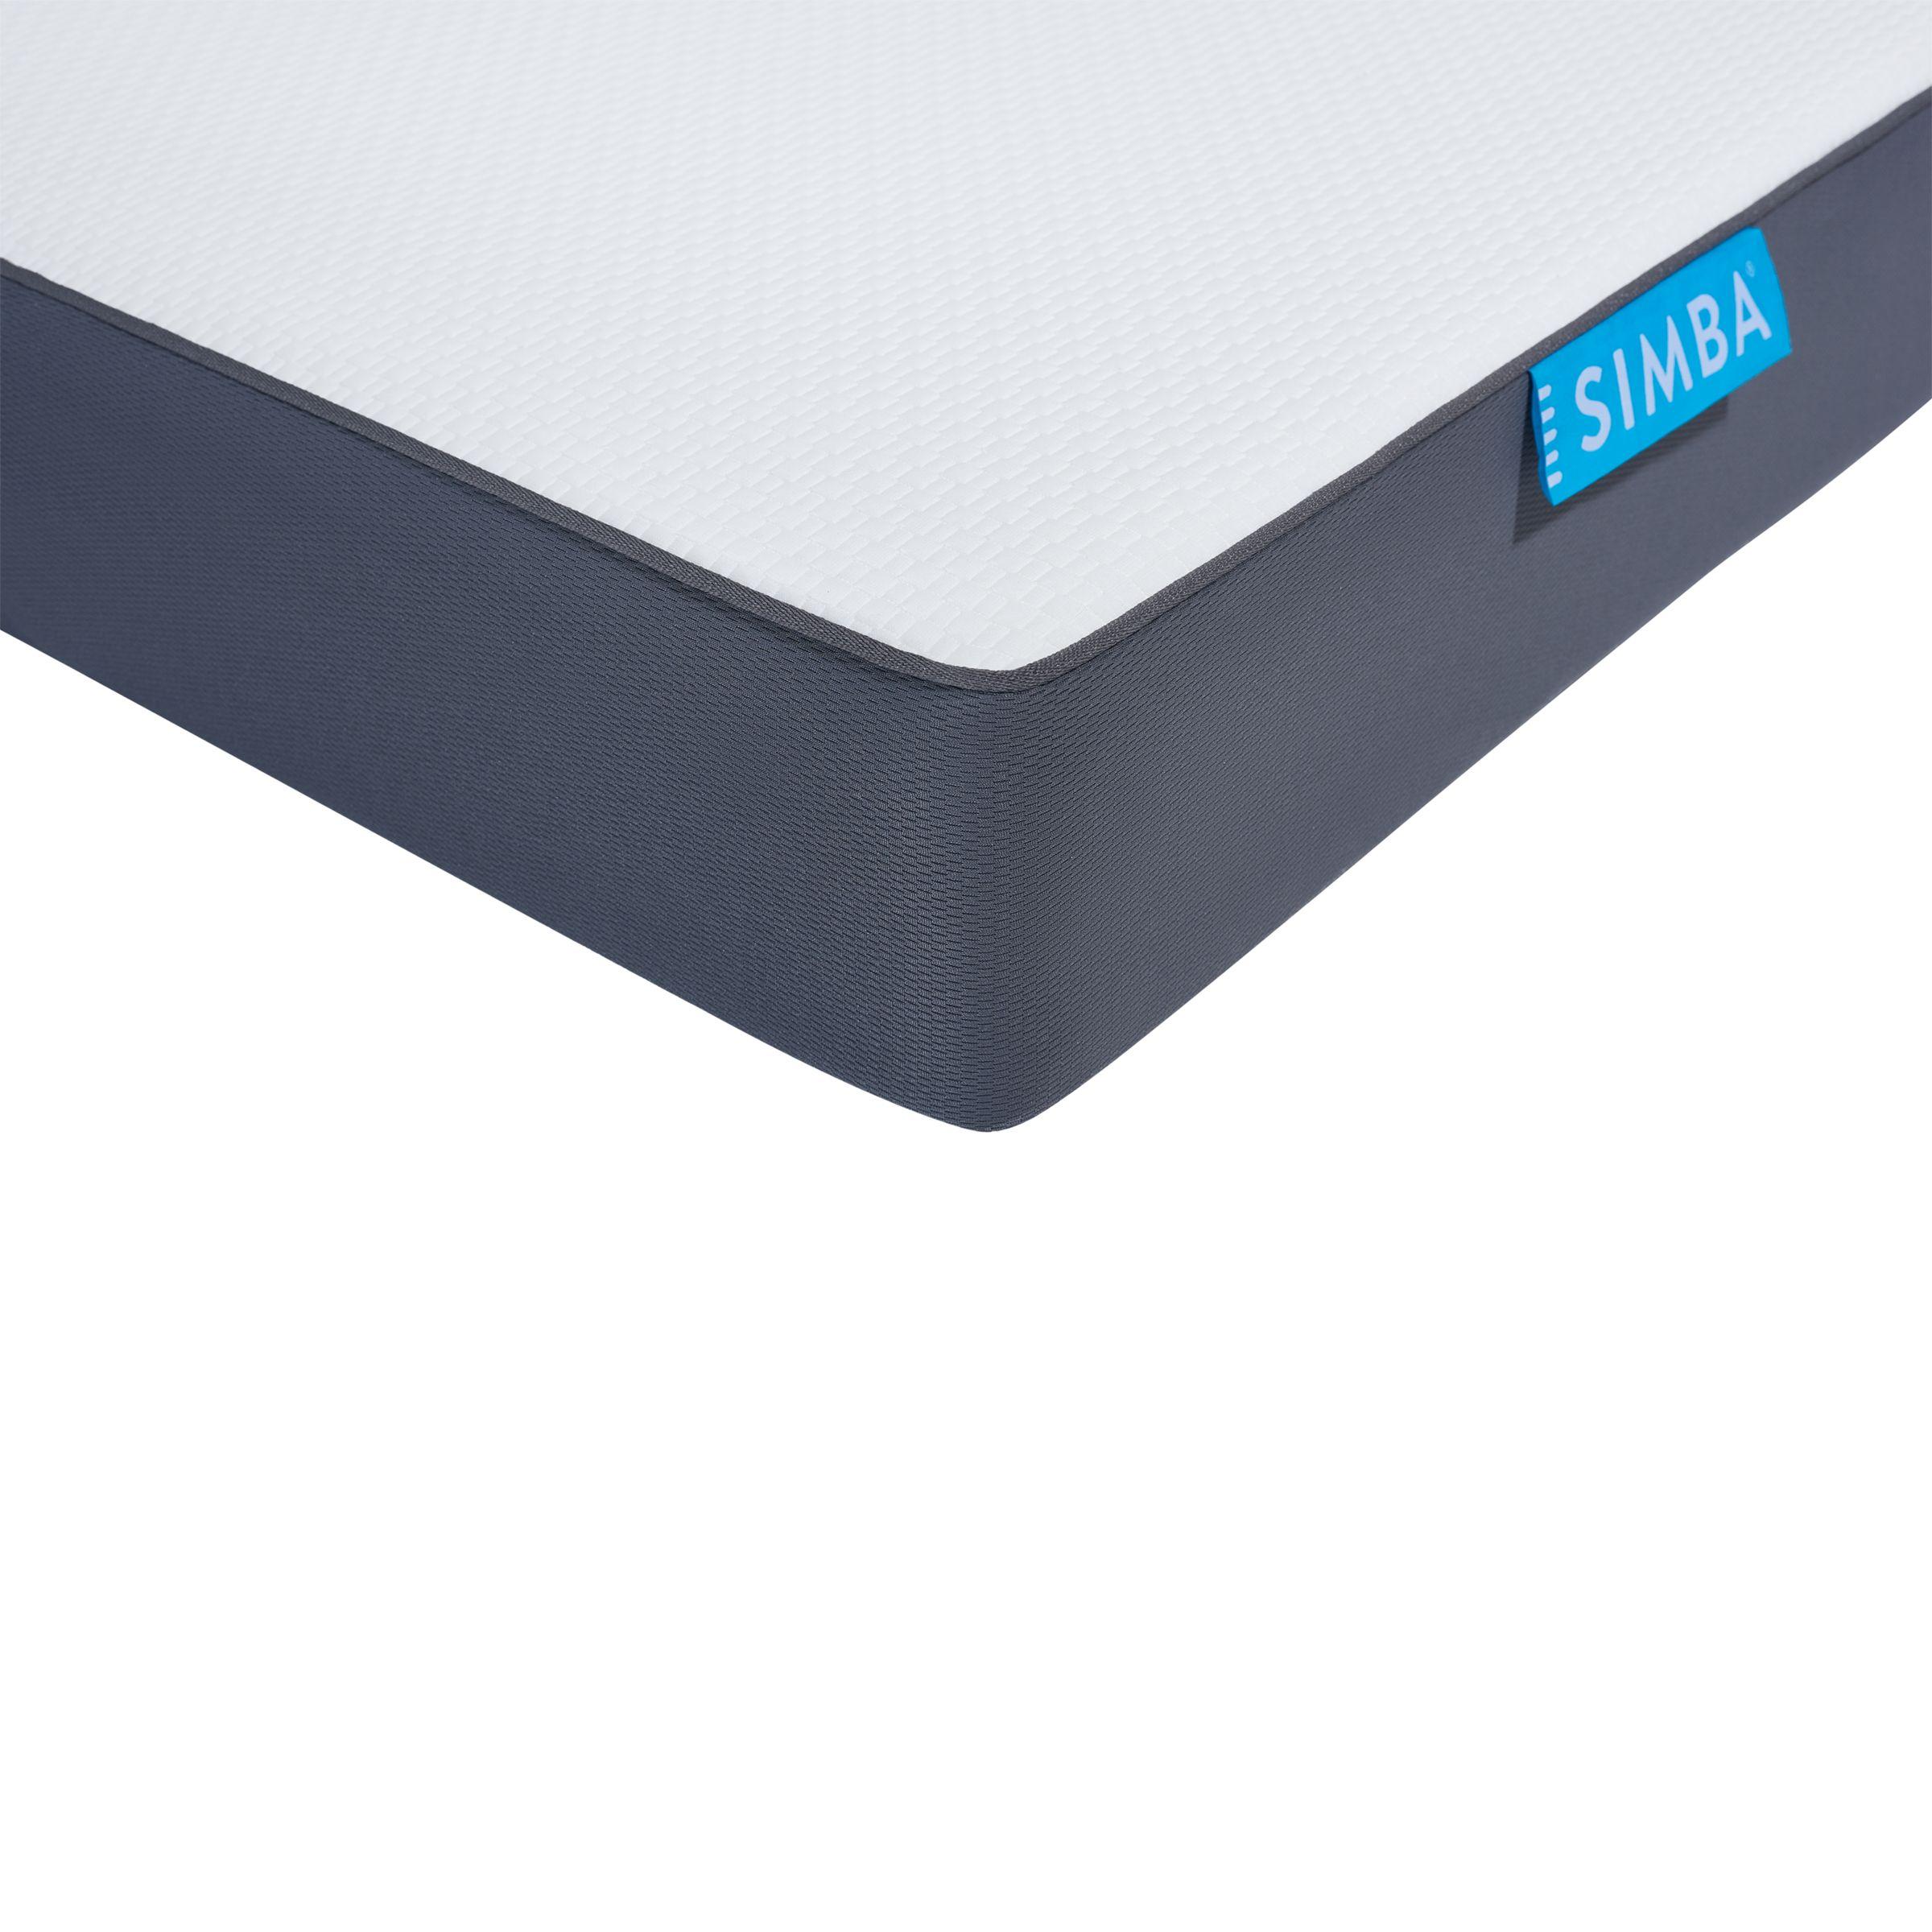 Simba SIMBA Hybrid® Bunk Bed Pocket Spring Mattress, Medium Tension, Single